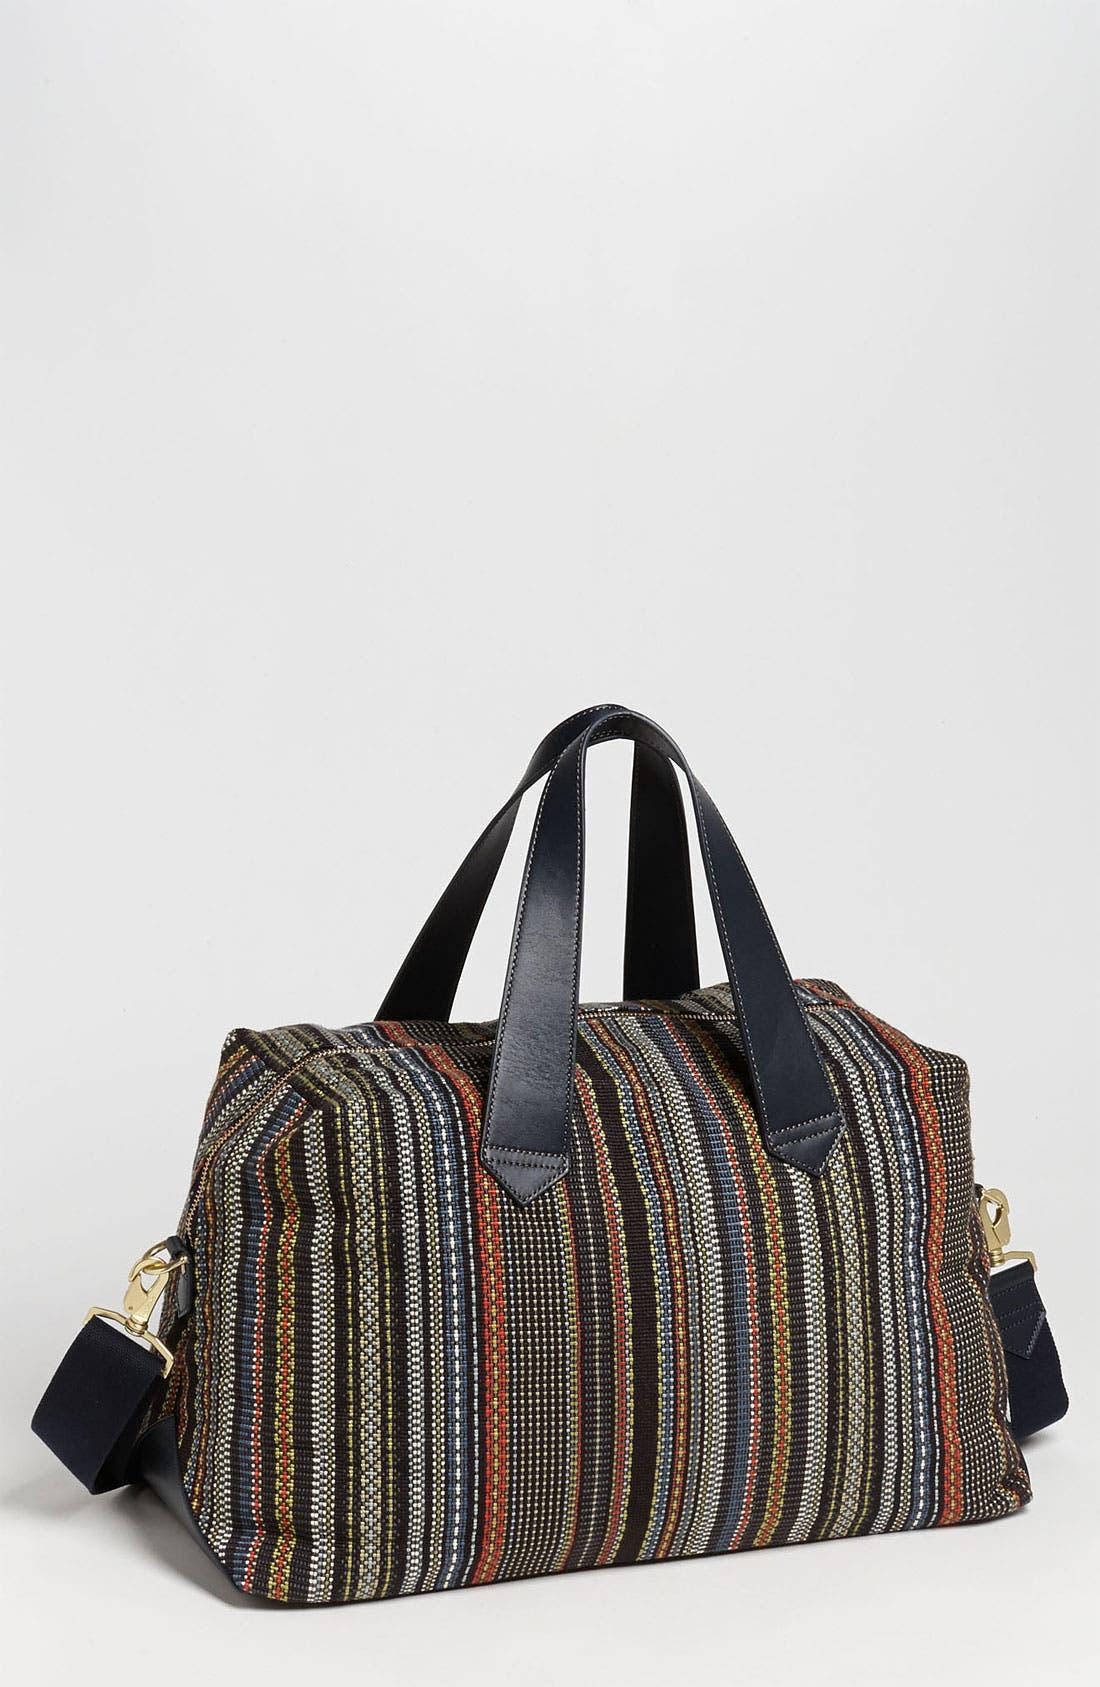 Alternate Image 1 Selected - Paul Smith Accessories 'Maharam' Bag